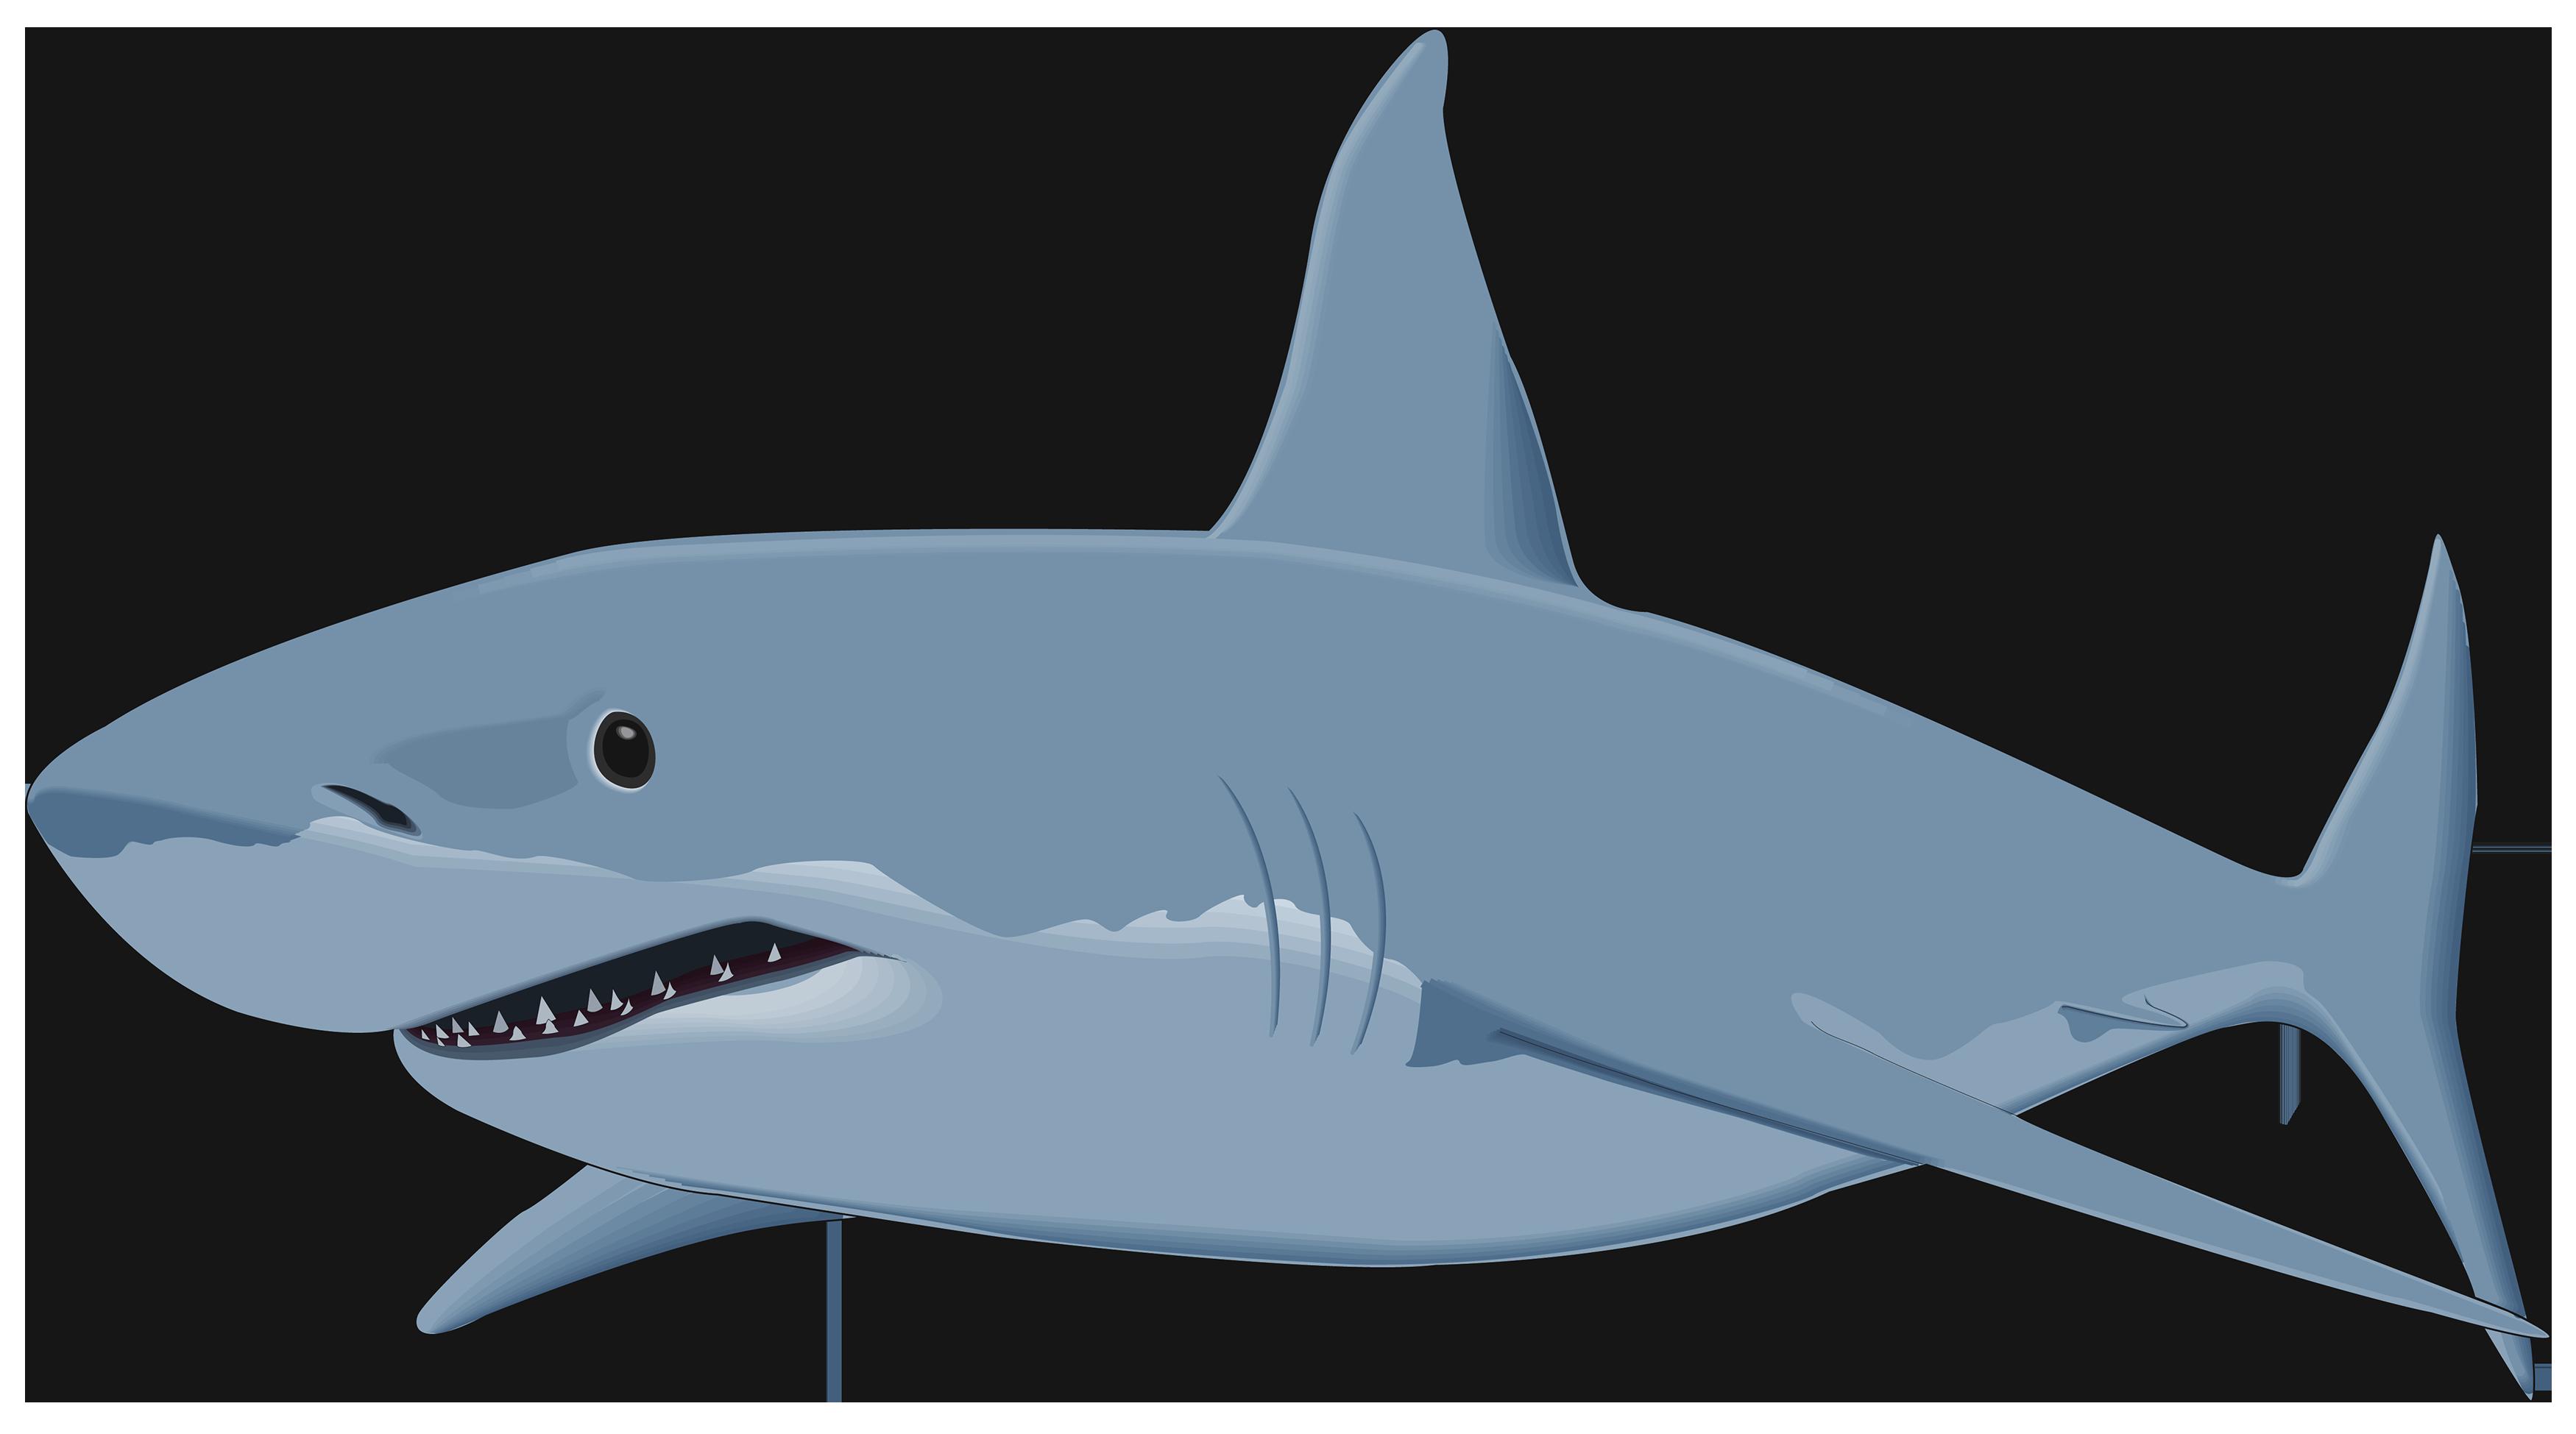 Shark Png Shark Images Shark Attack Clip Art